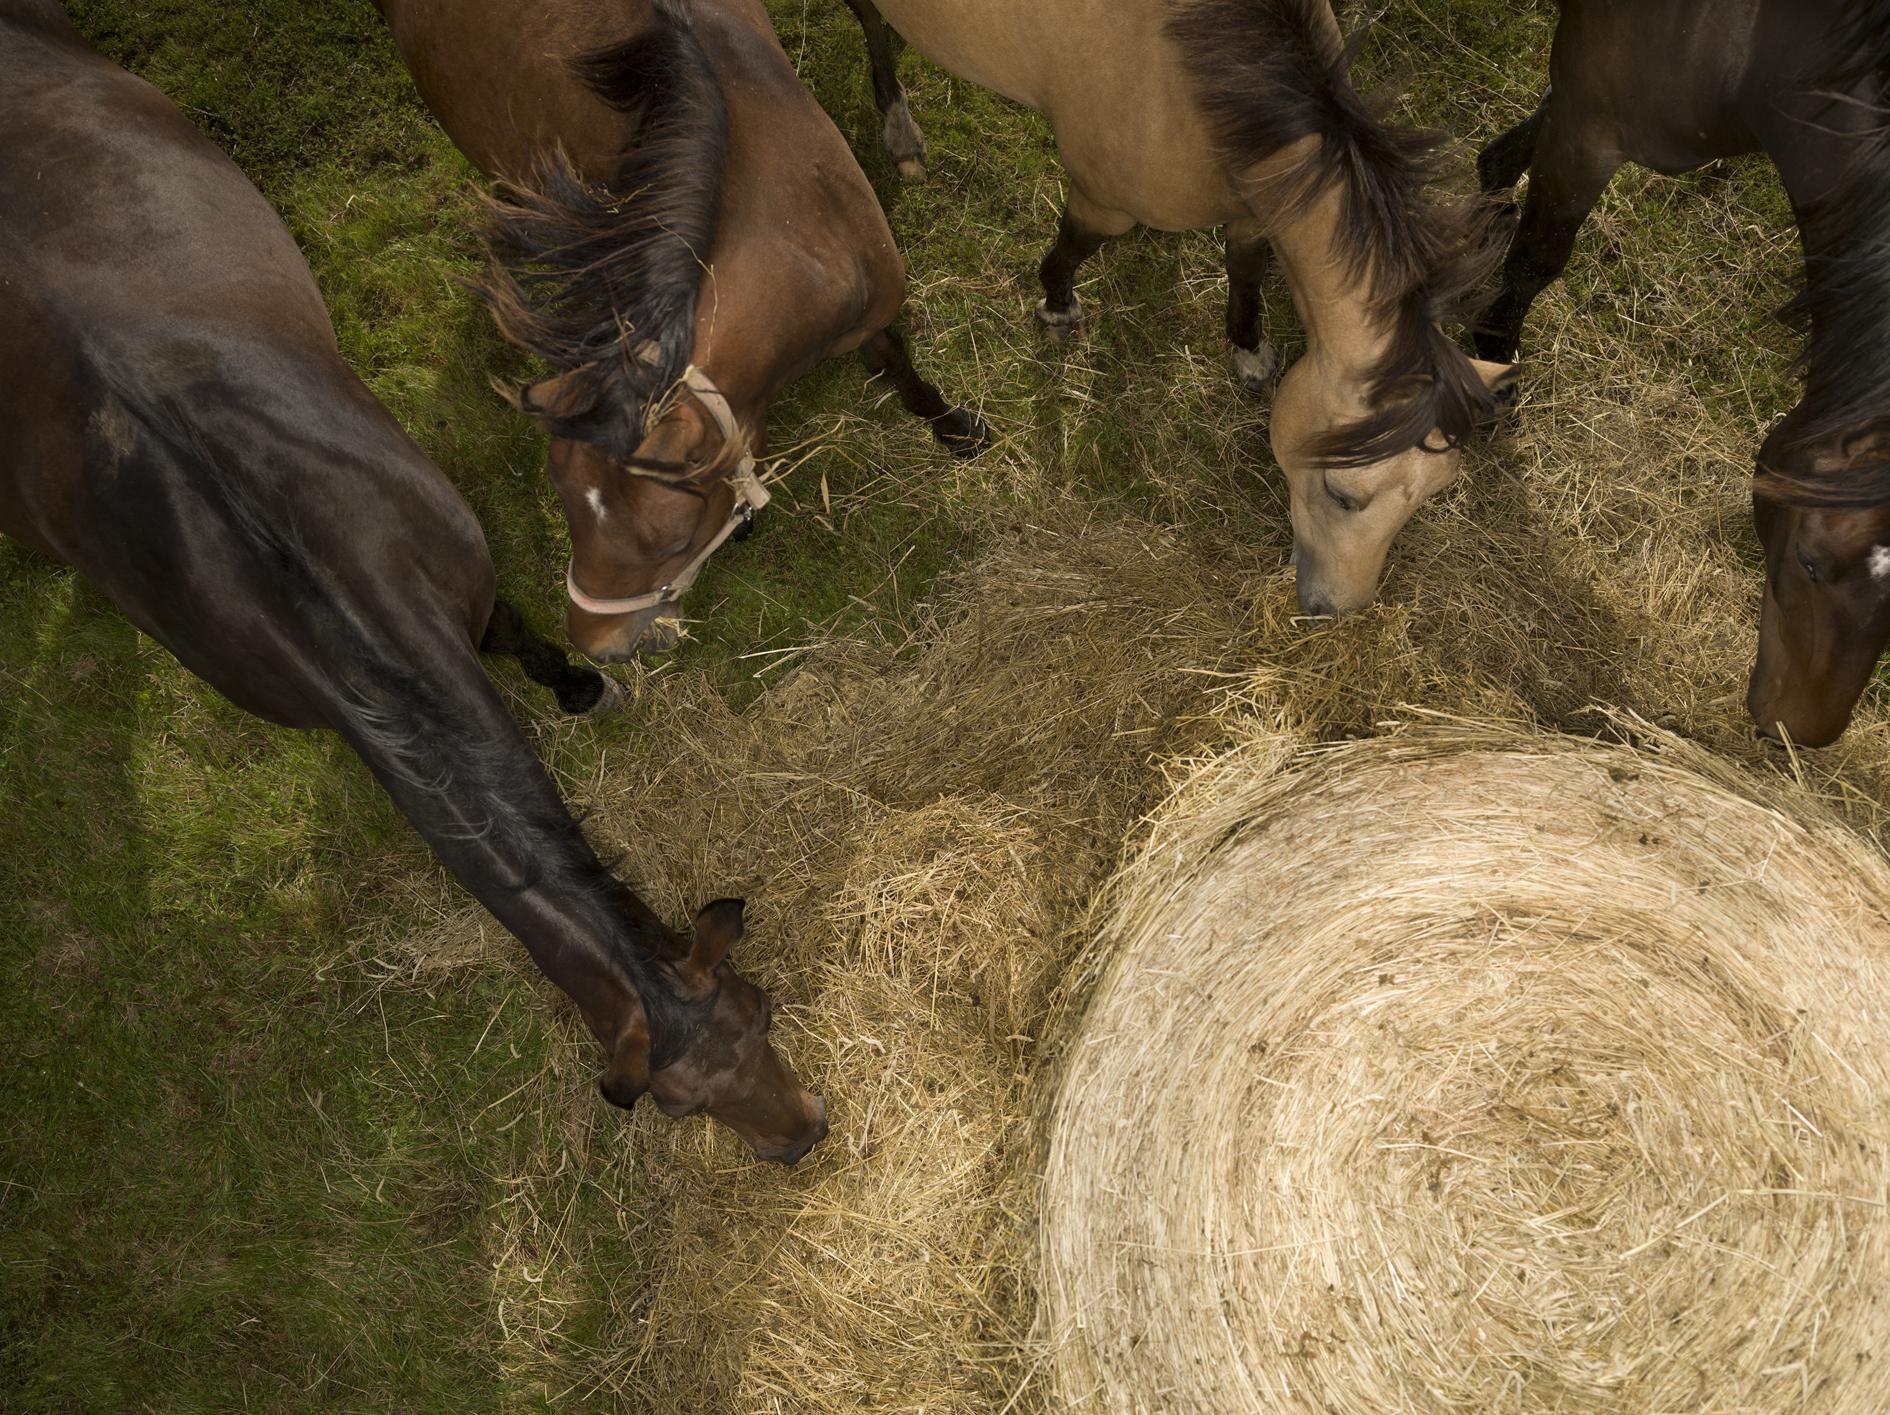 behavioural disturbances www forageforhorses   en